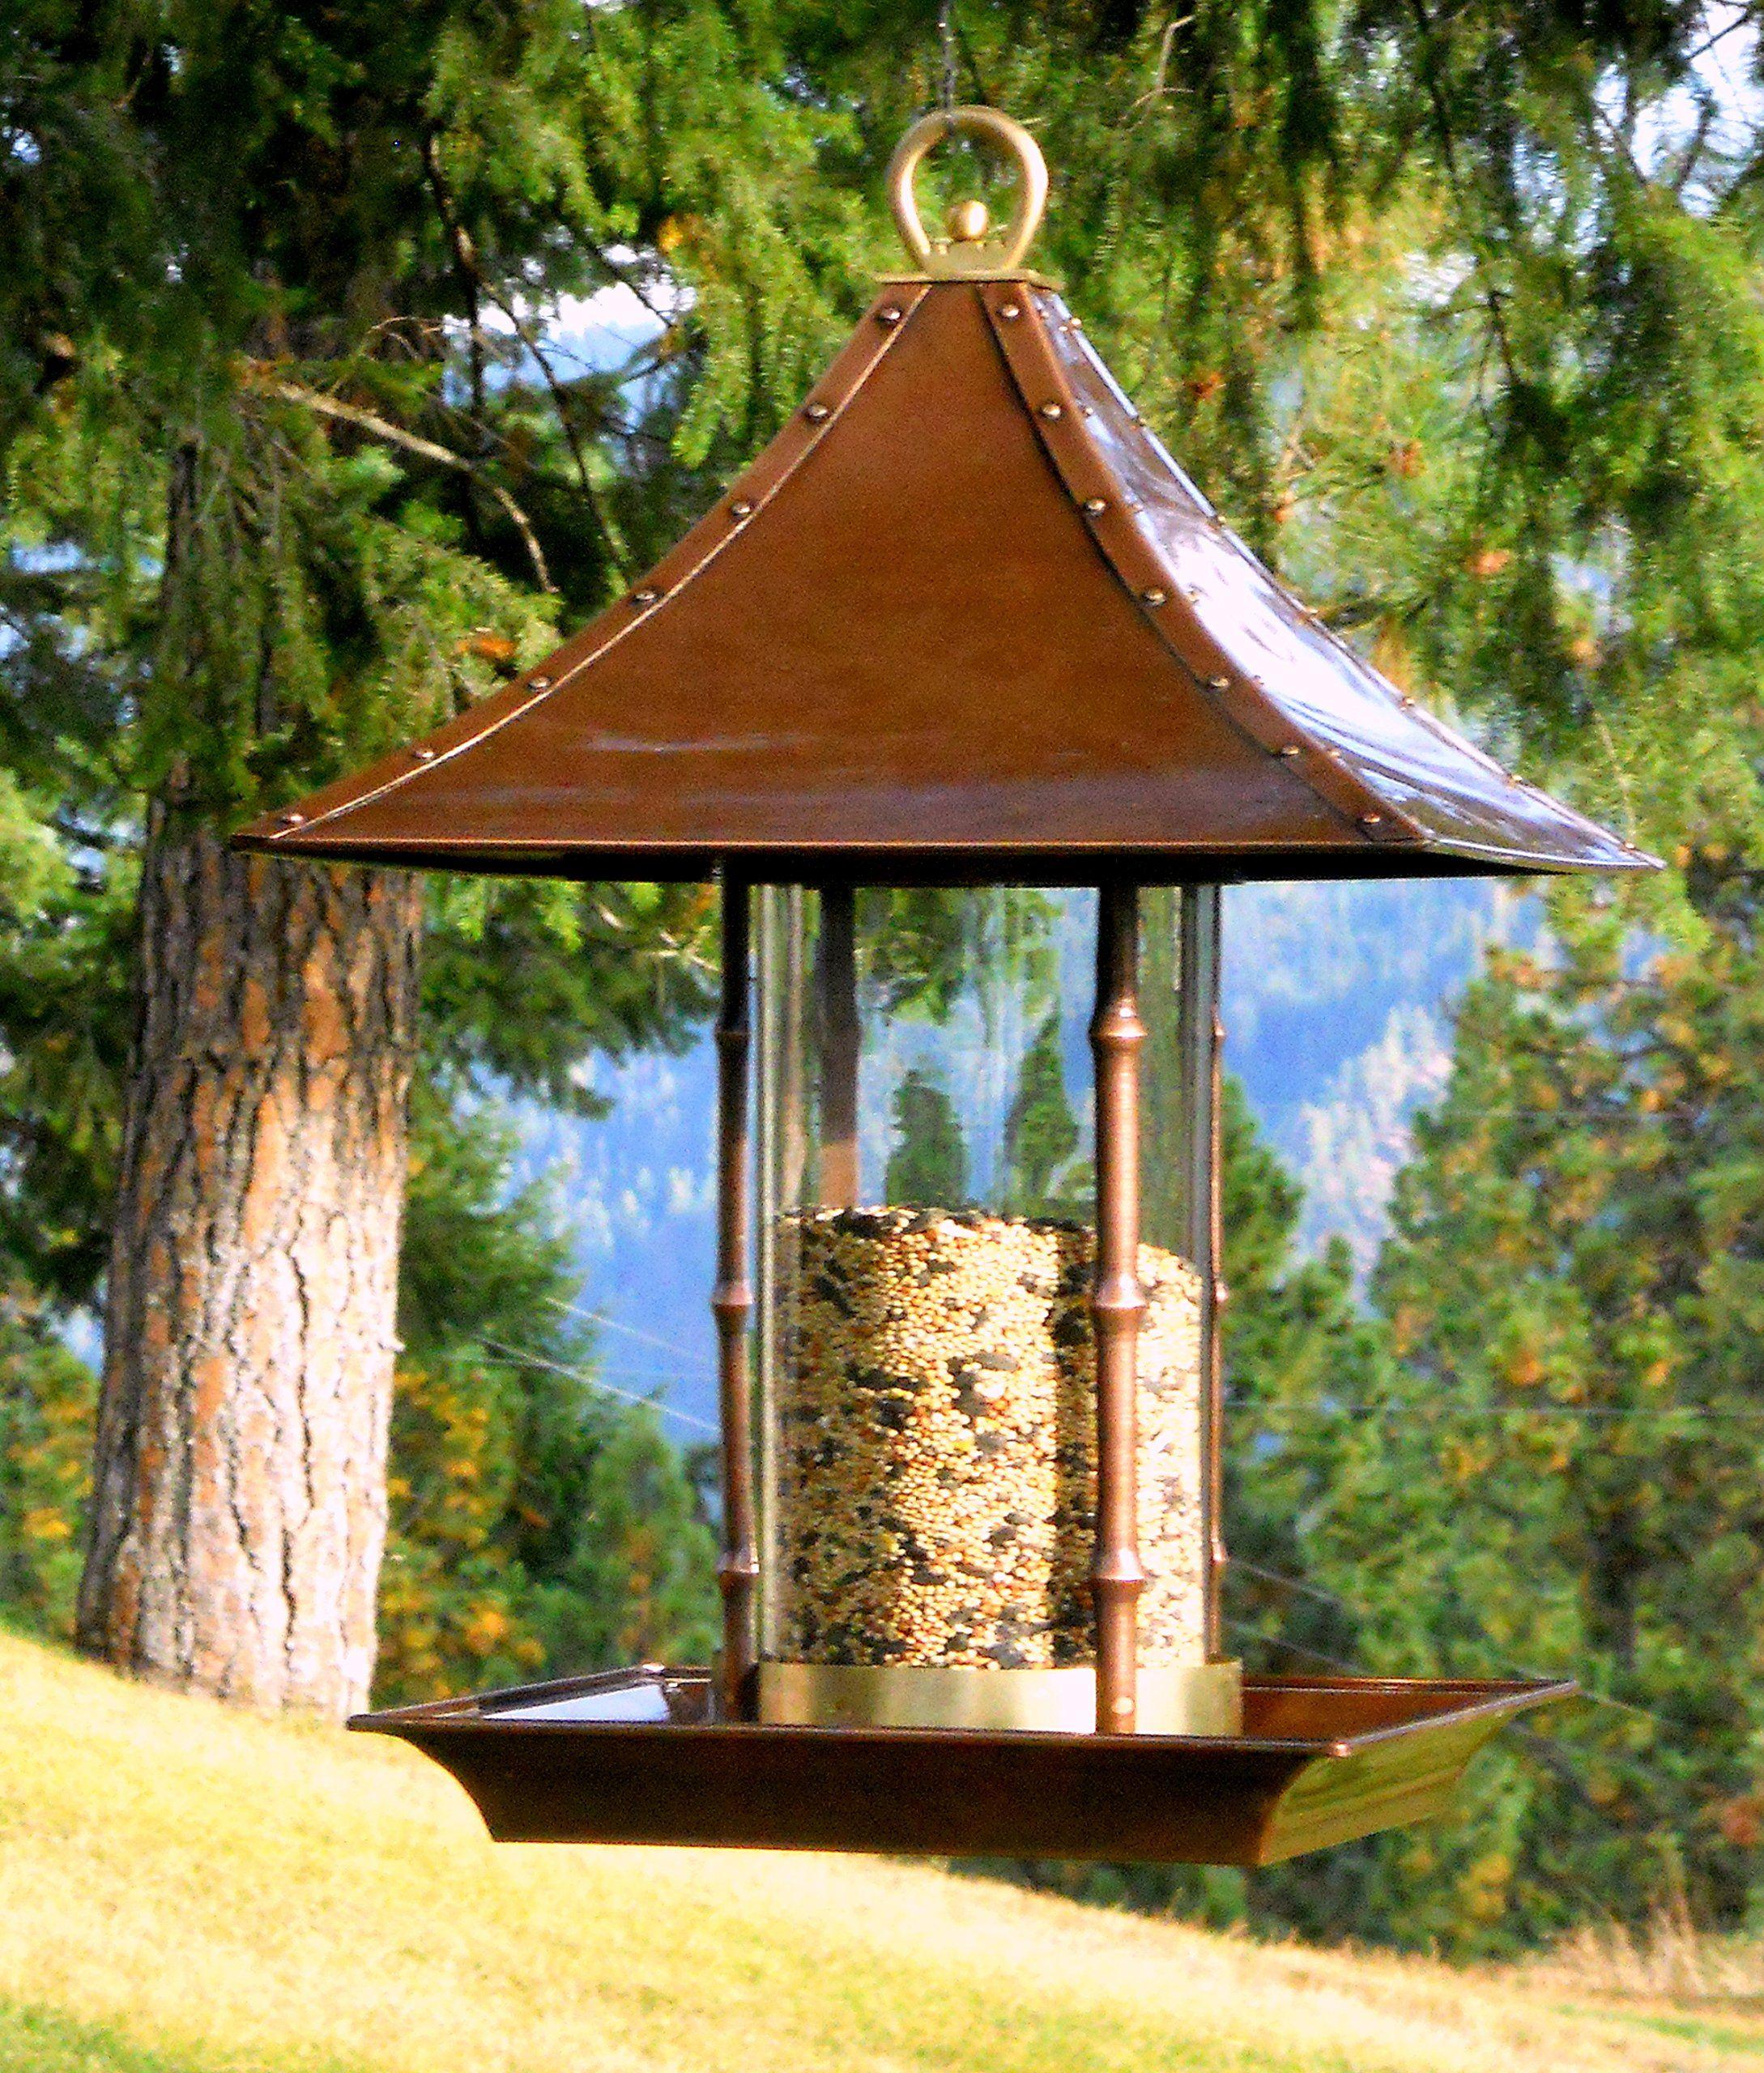 h potter large bamboo wild bird feeder ideas for a backyard